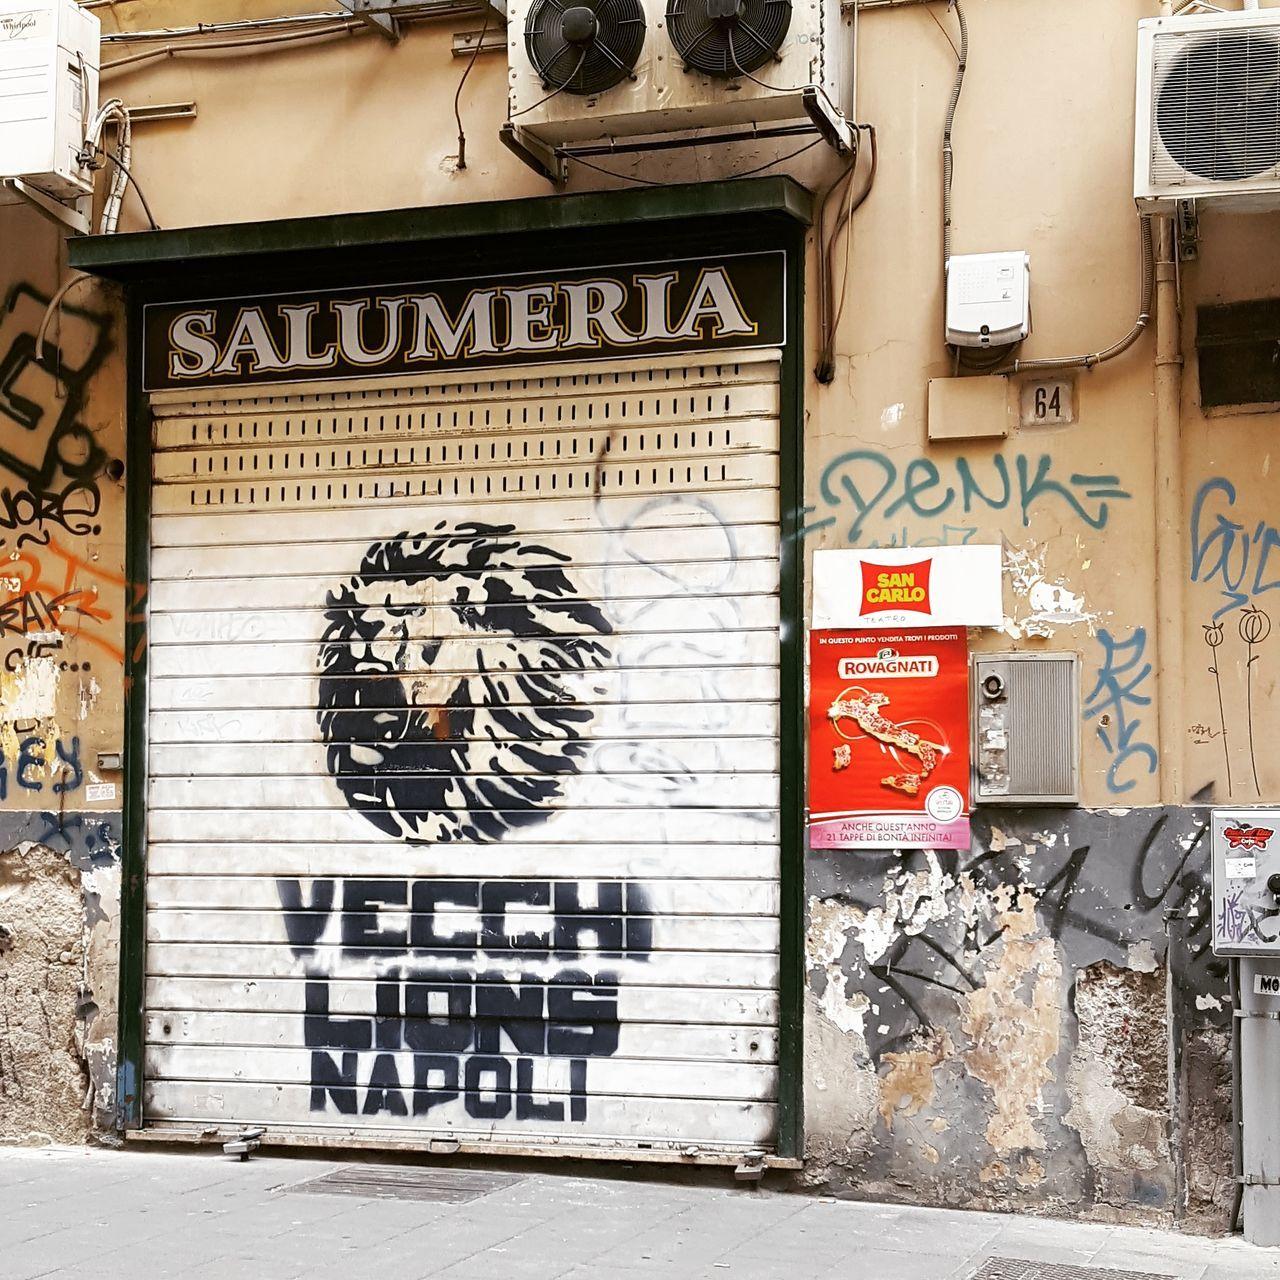 Text Graffiti Street Art Architecture Day Outdoors Built Structure No People Building Exterior City Ghetto Urbanphotography Napoli Italia Napoli ❤ Italy🇮🇹